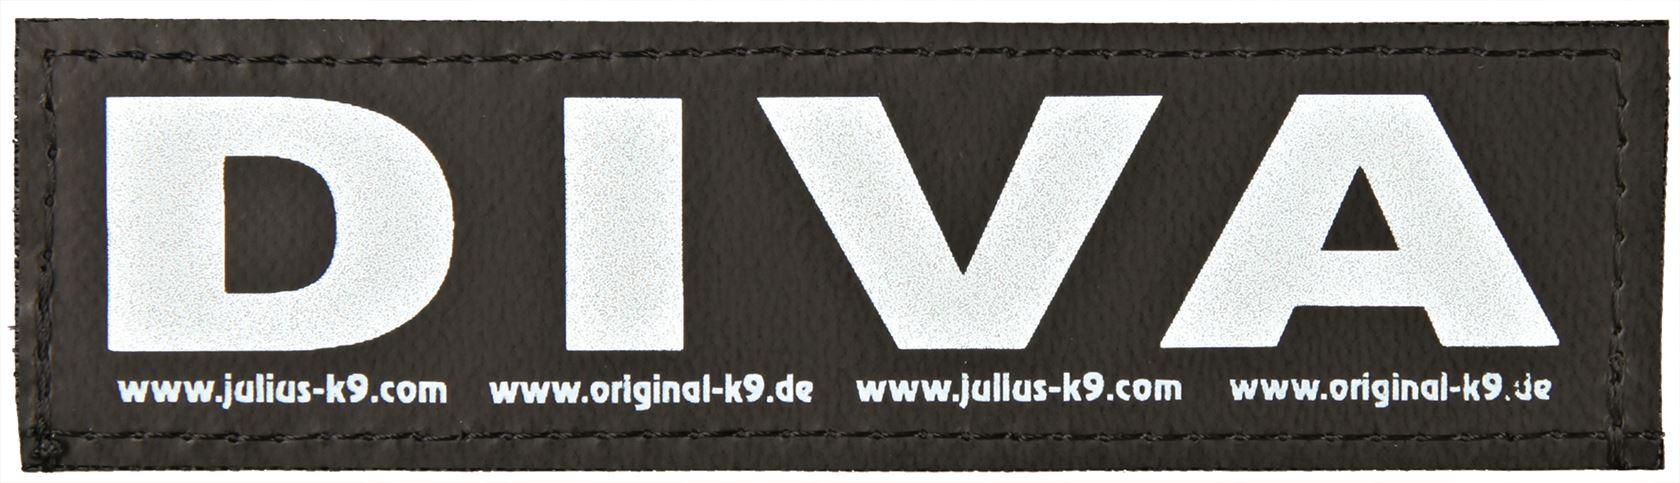 julius-k9 velcro sticker small diva (2sts)